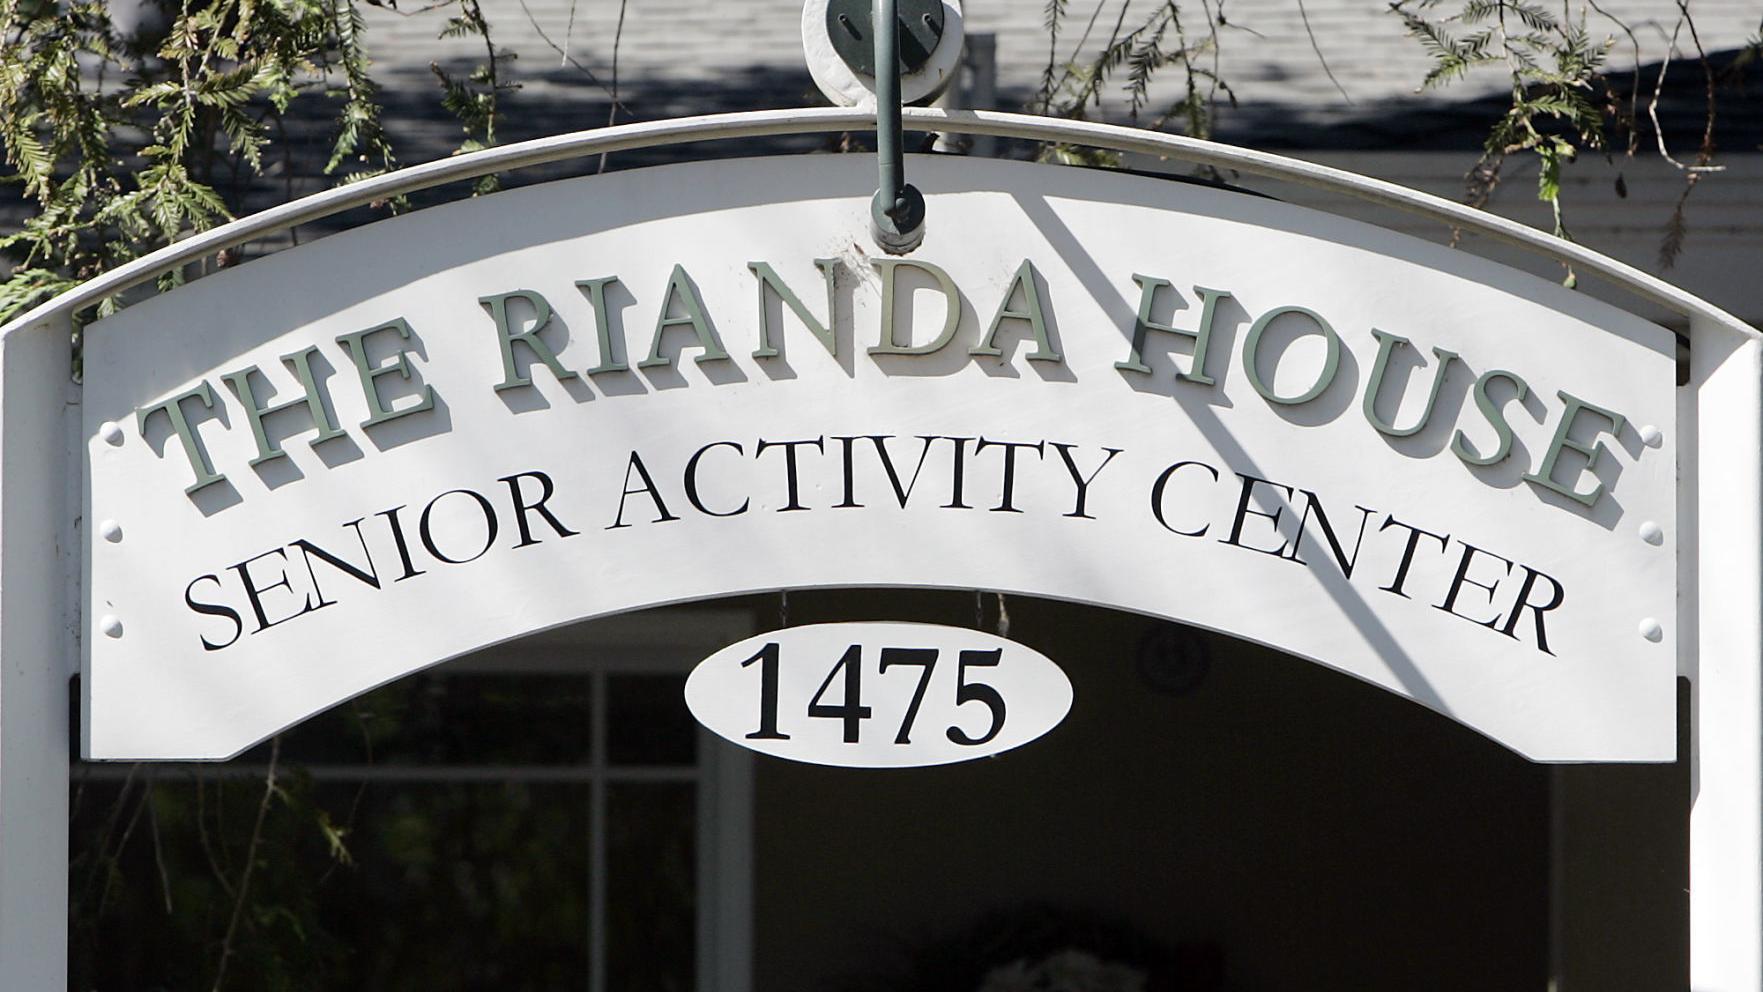 New spring meditation series for seniors at St. Helena's Rianda House